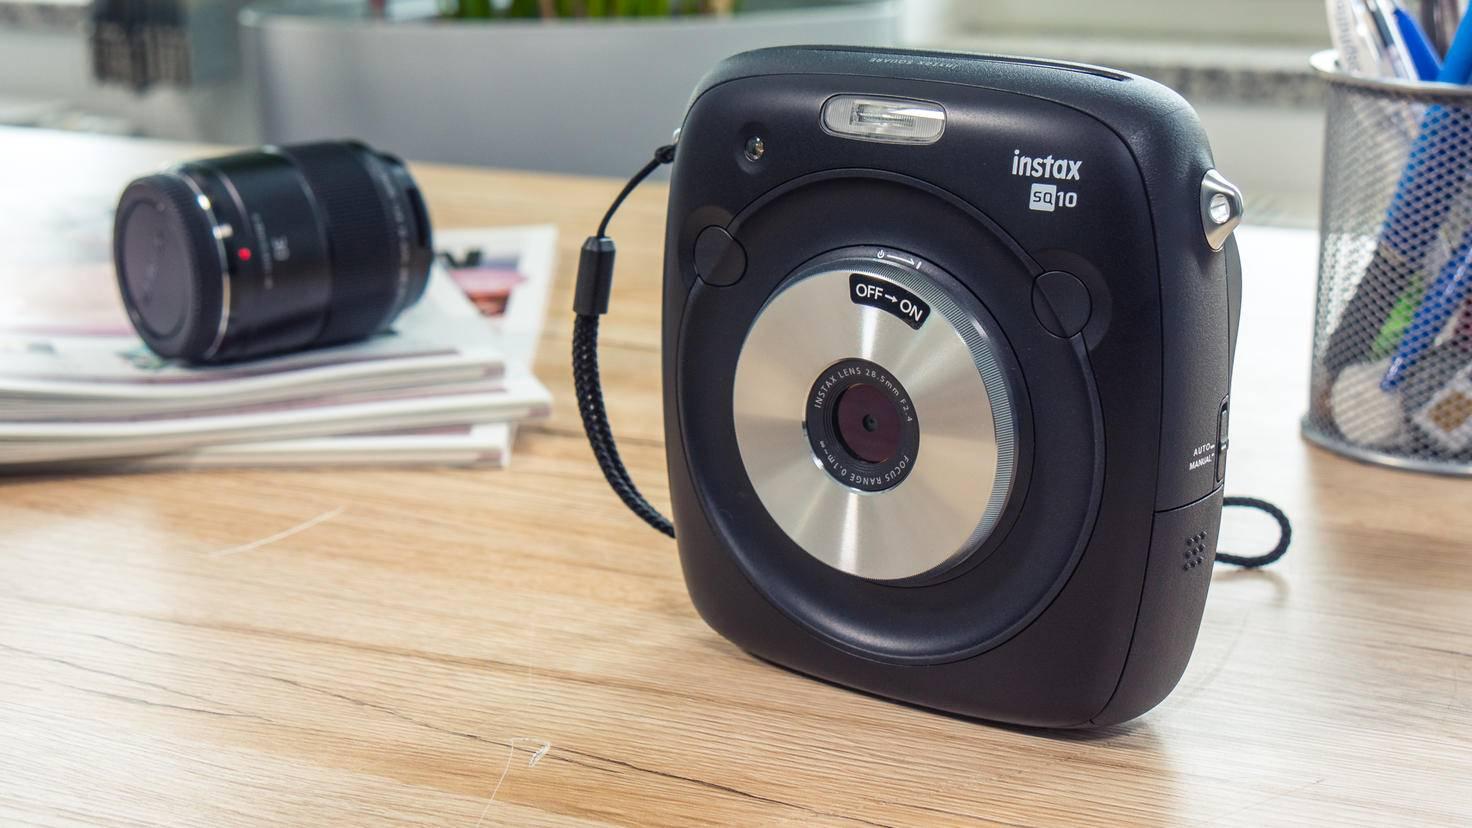 Fujifilm Instax Square SQ10-14-TURN ON